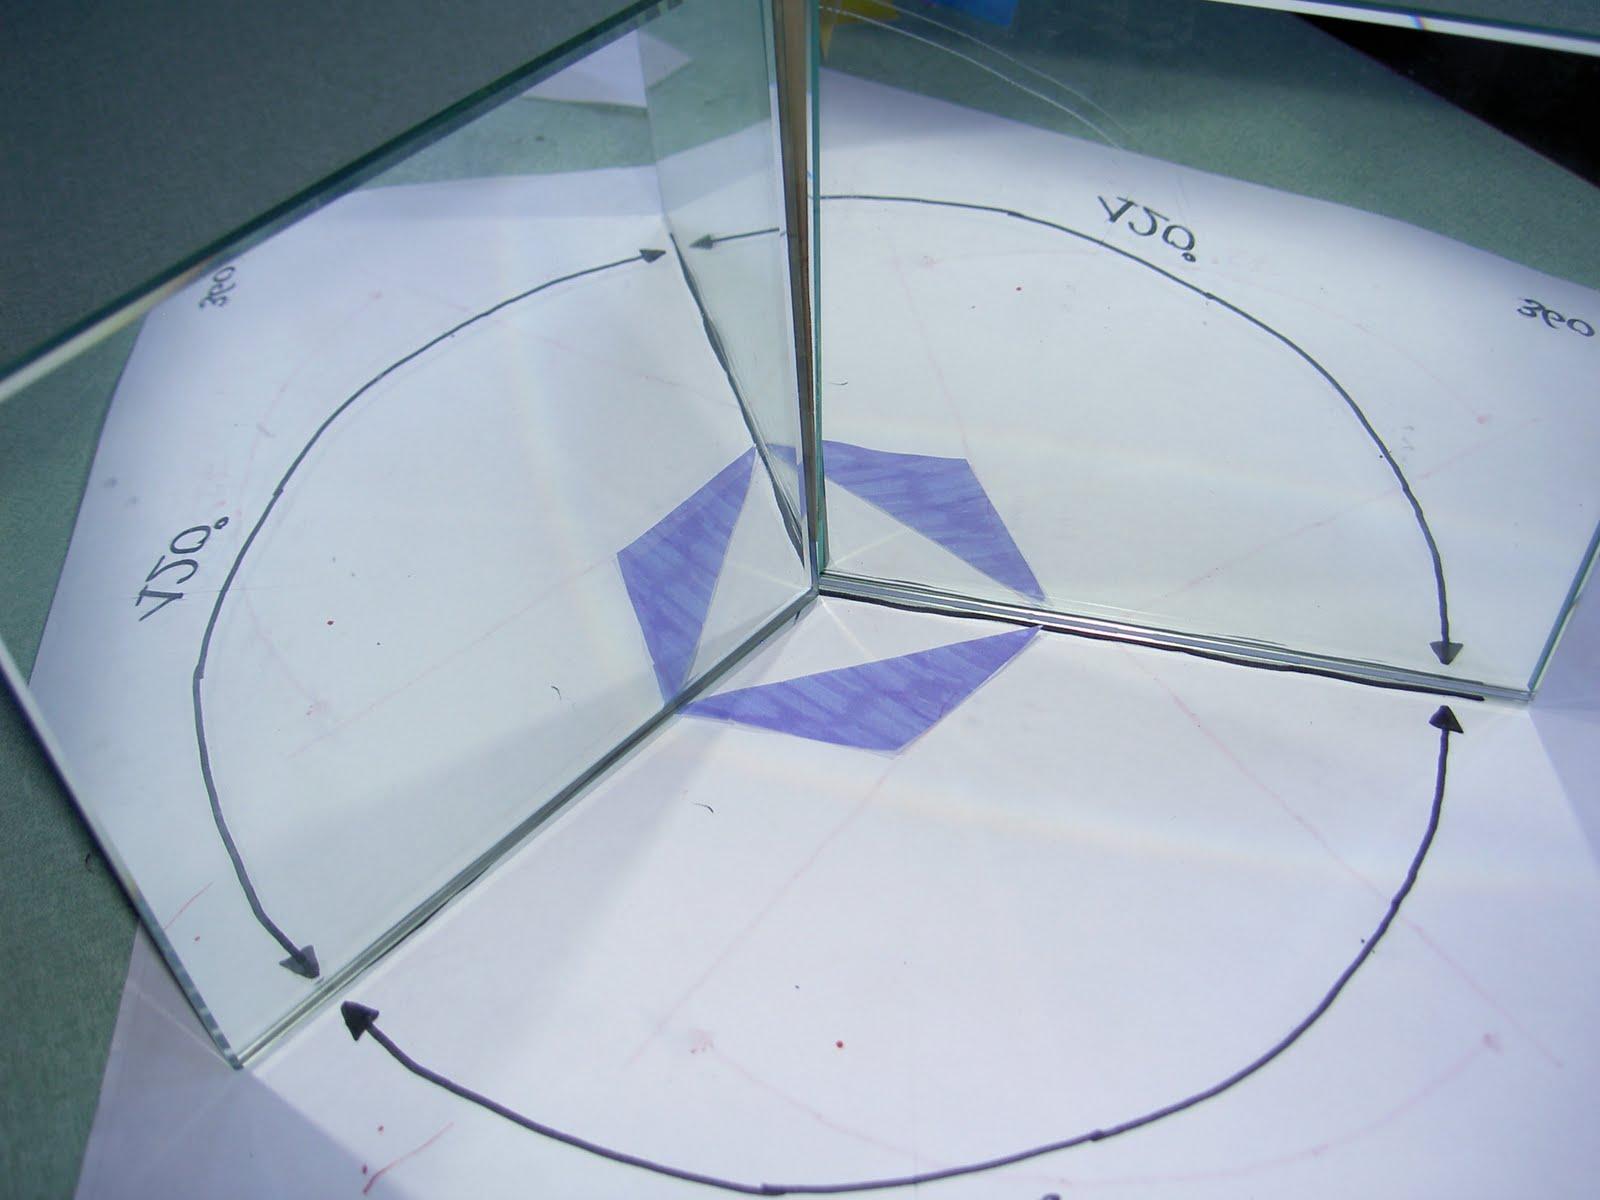 Riflessioni geometriche 2 parte - Specchi riflessi audio due ...